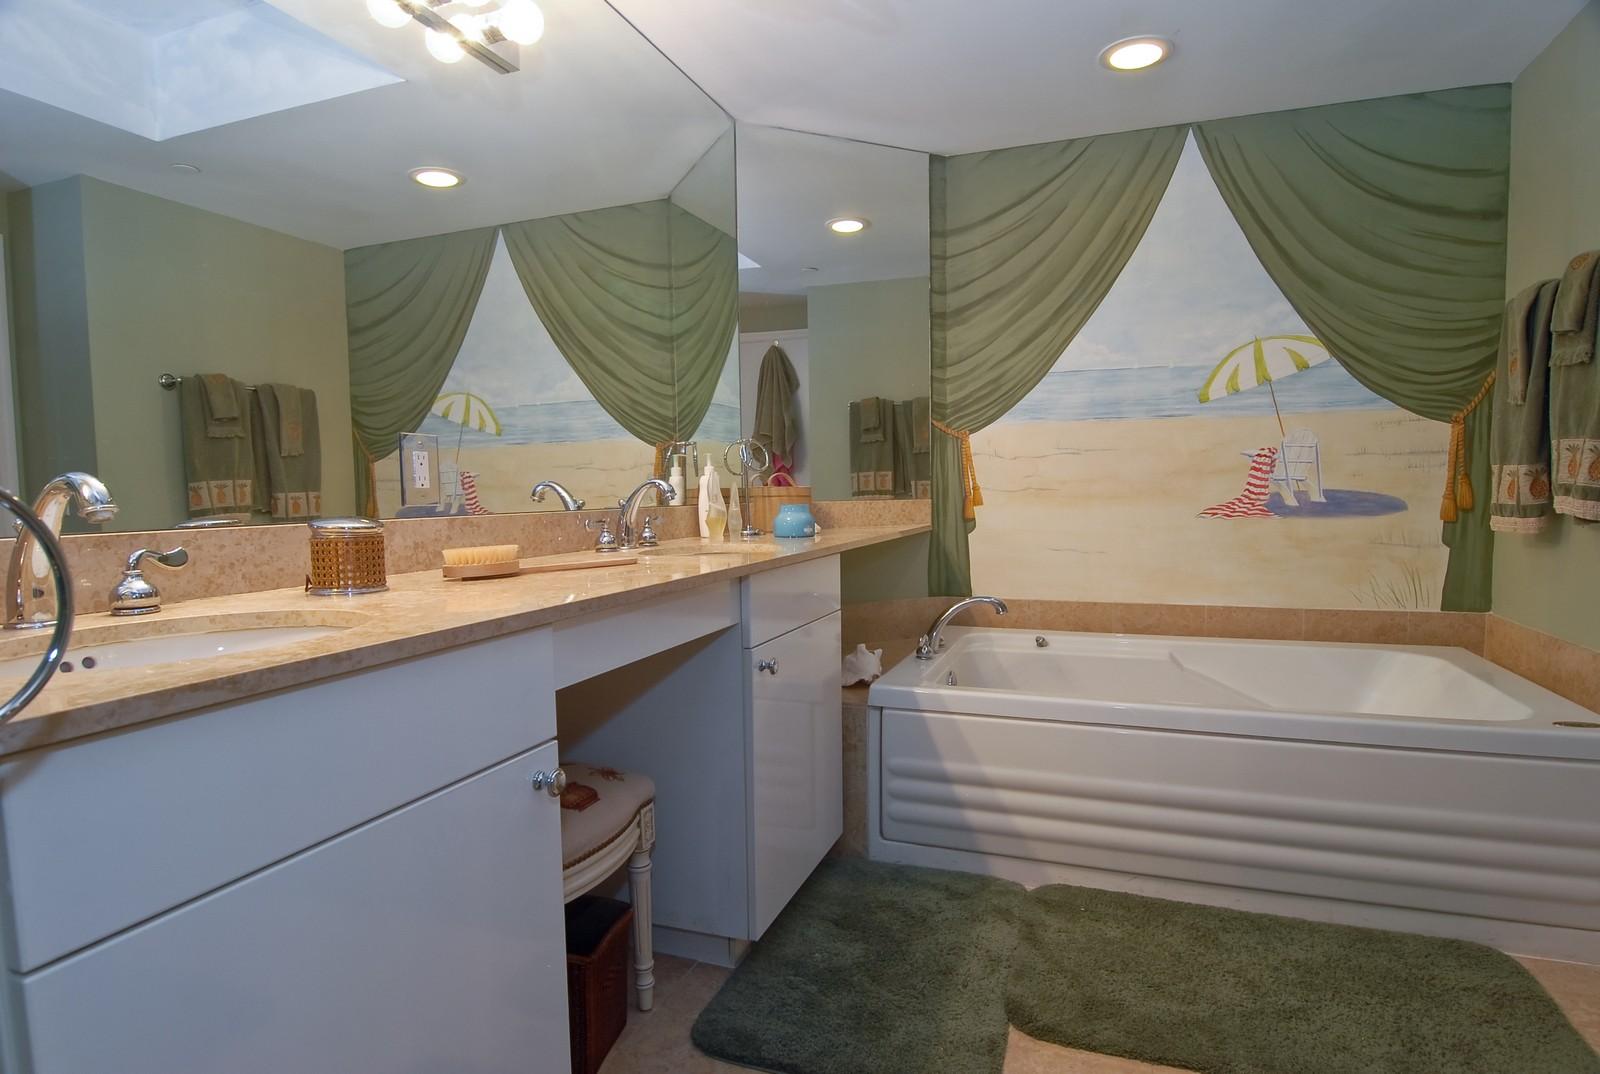 Real Estate Photography - 4779 Collins Ave, Unit 1901, Miami Beach, FL, 33140 - Master Bathroom